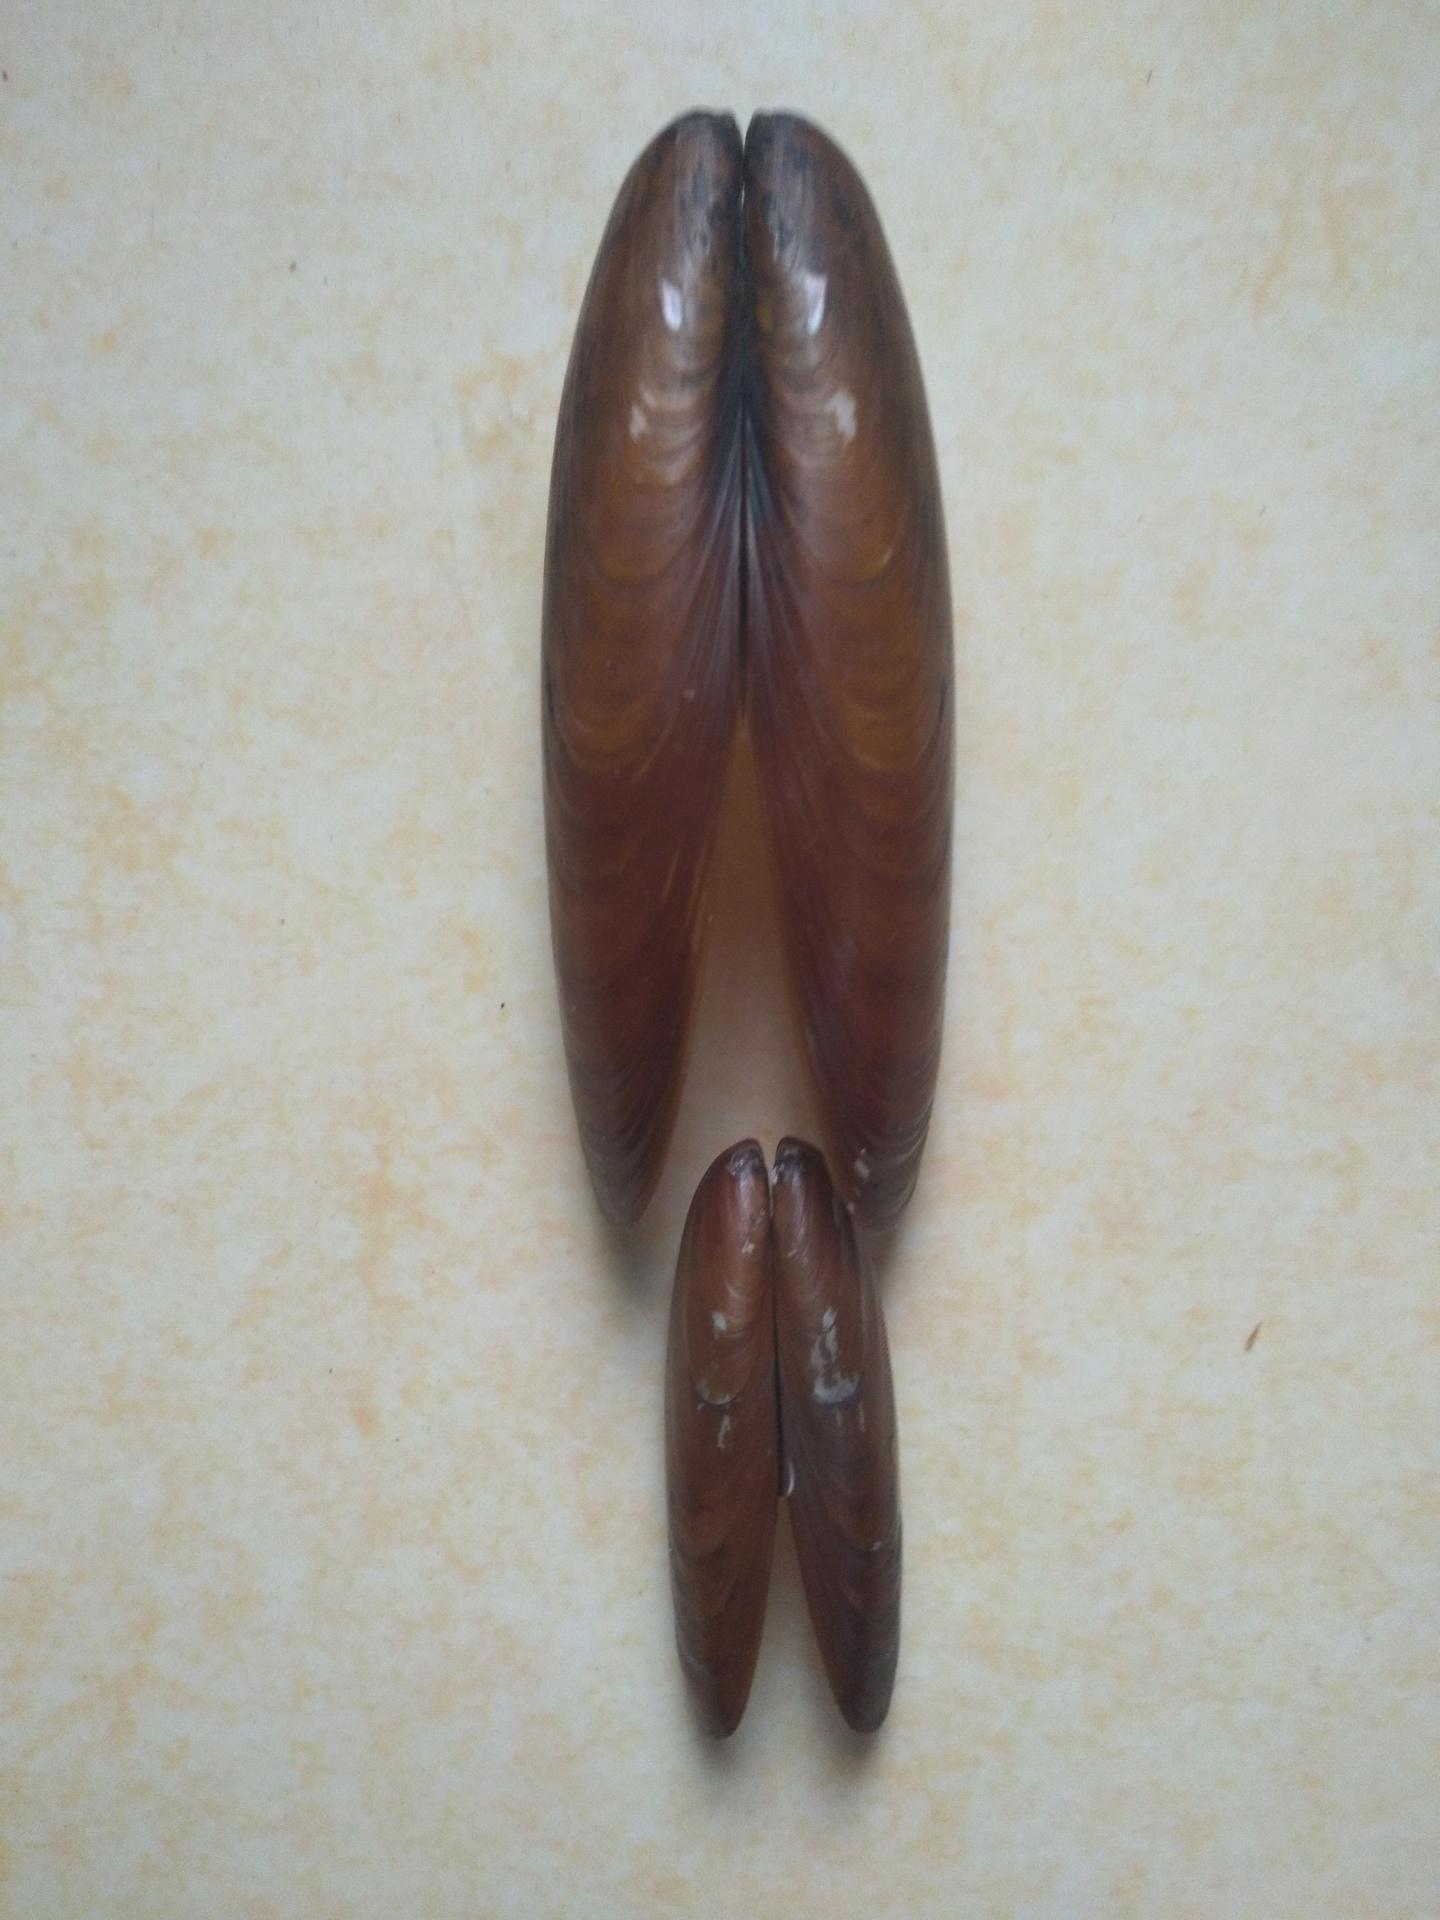 Lithophaga_lithophaga (Linnaeus, 1758) Fjimg_30